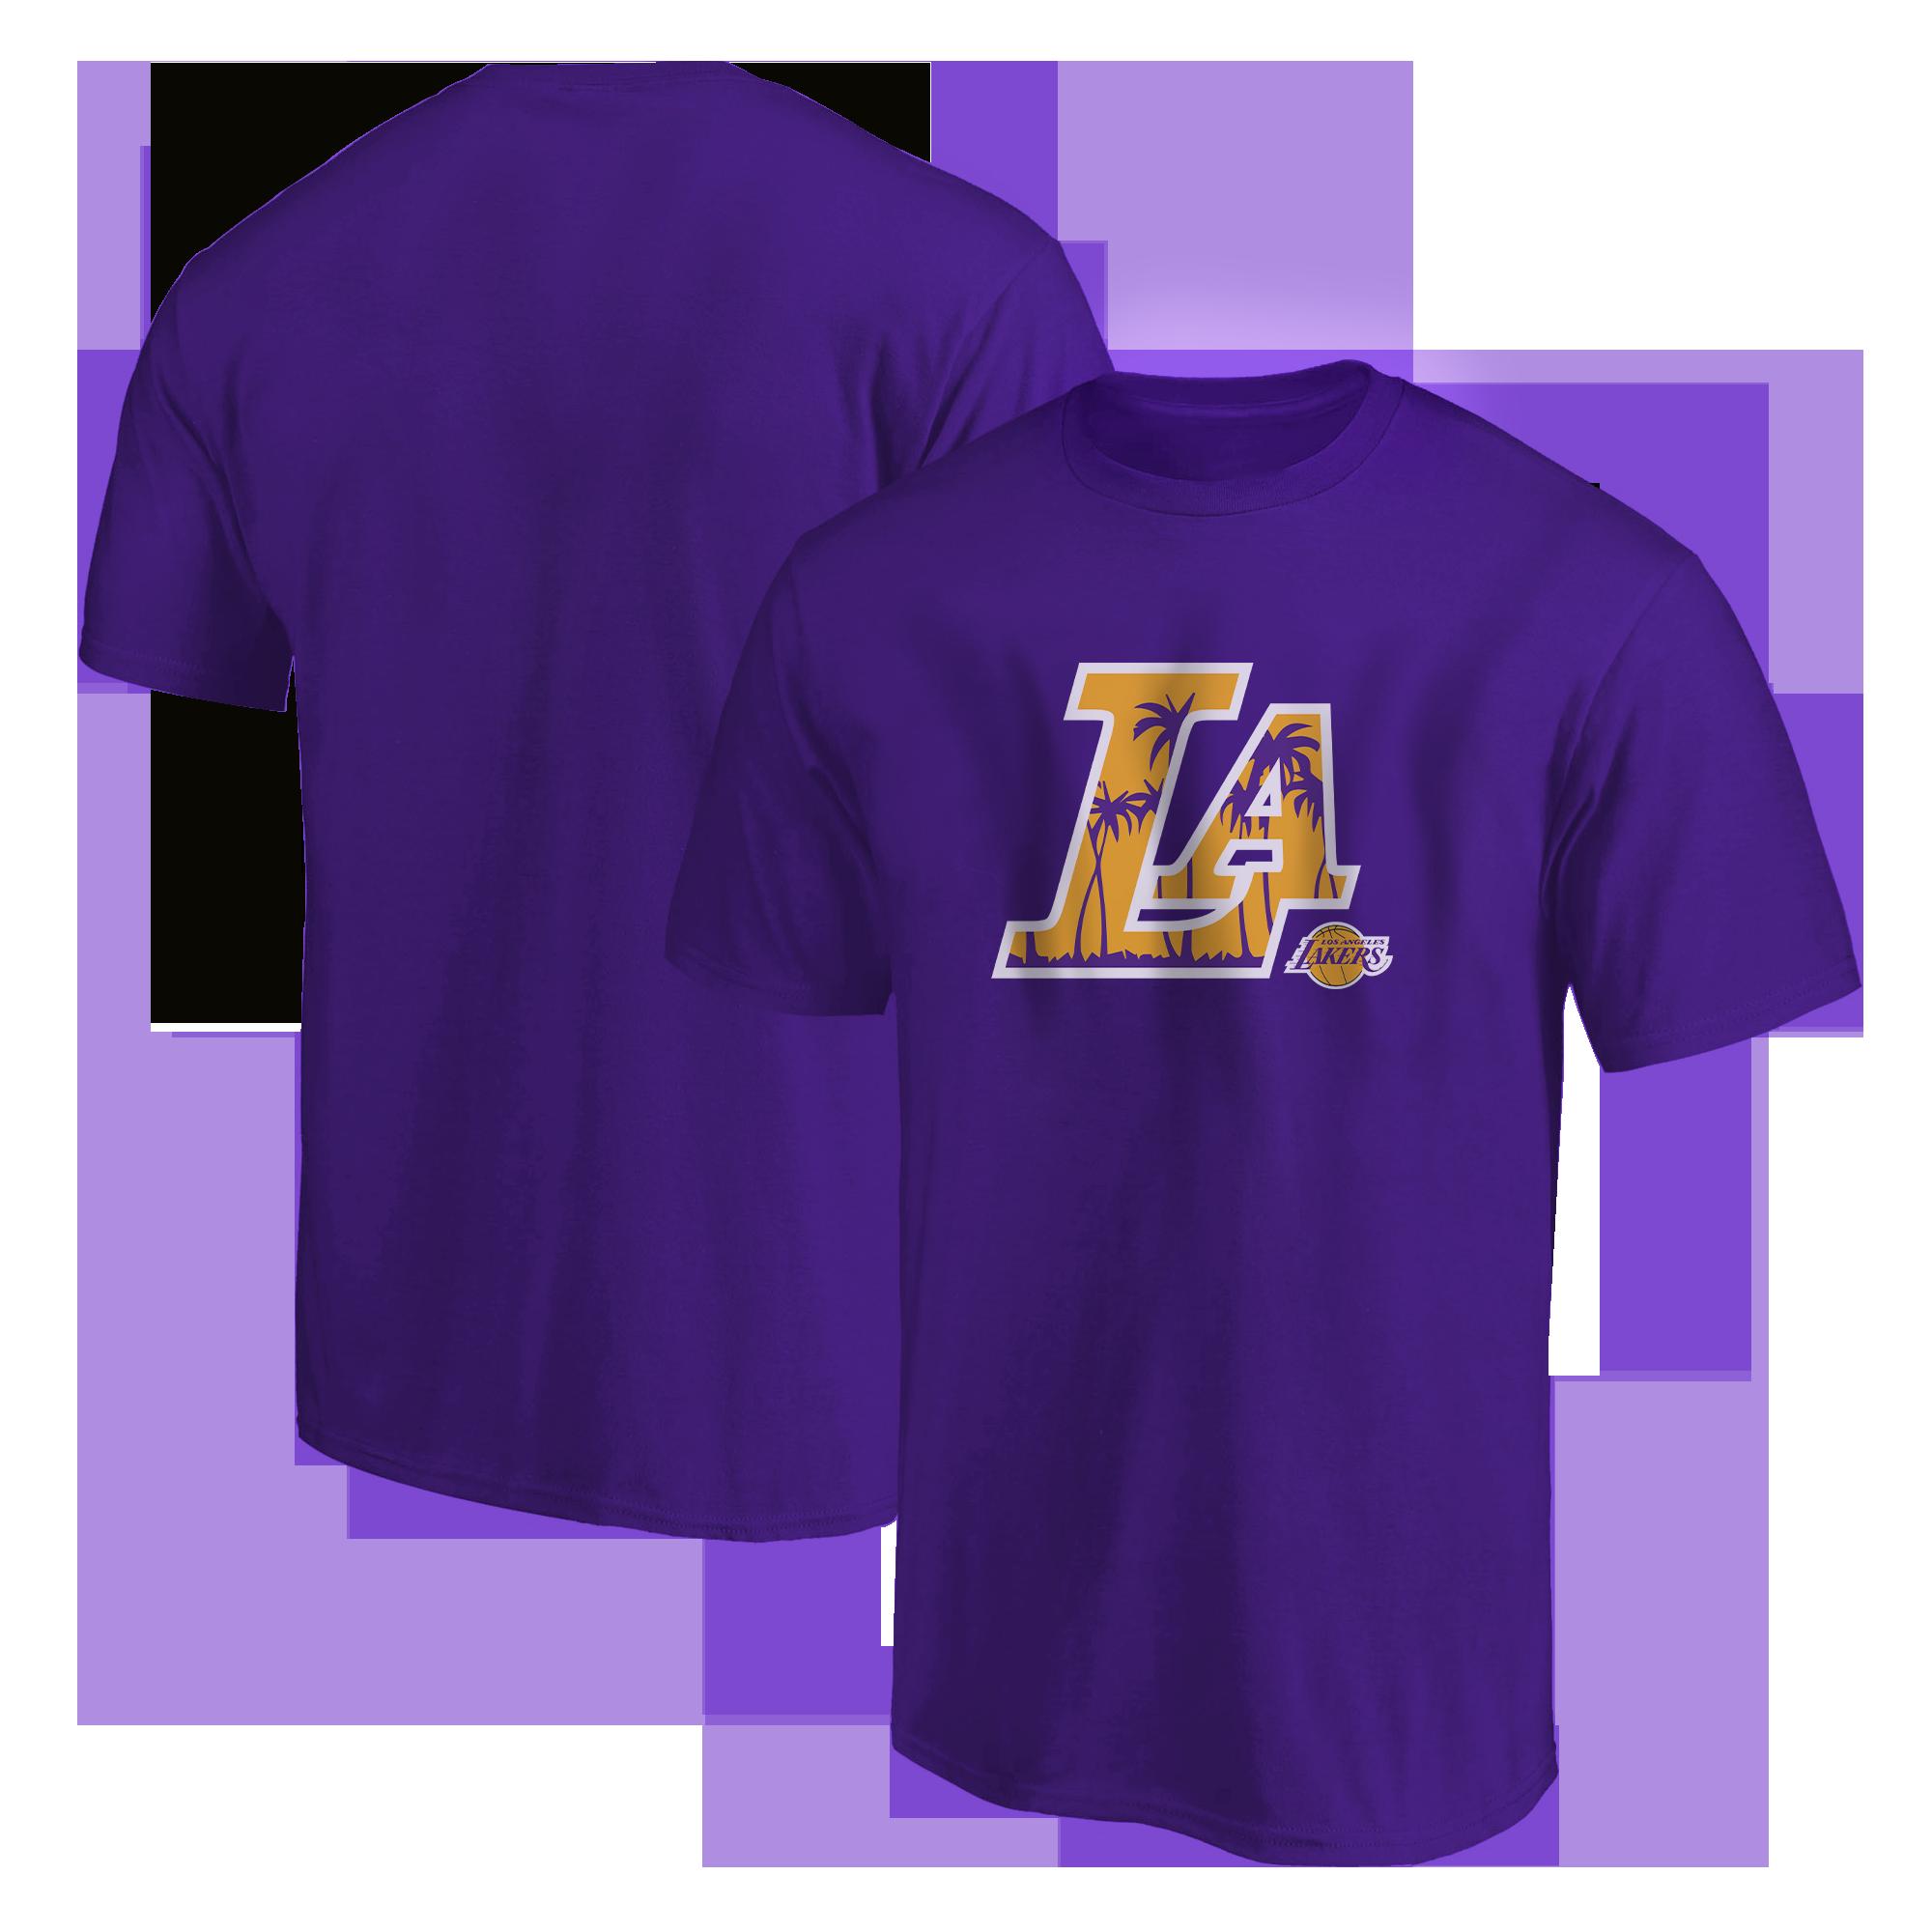 L.A. Lakers  Tshirt (TSH-PRP-NP-142-NBA-LAL-L.A.)